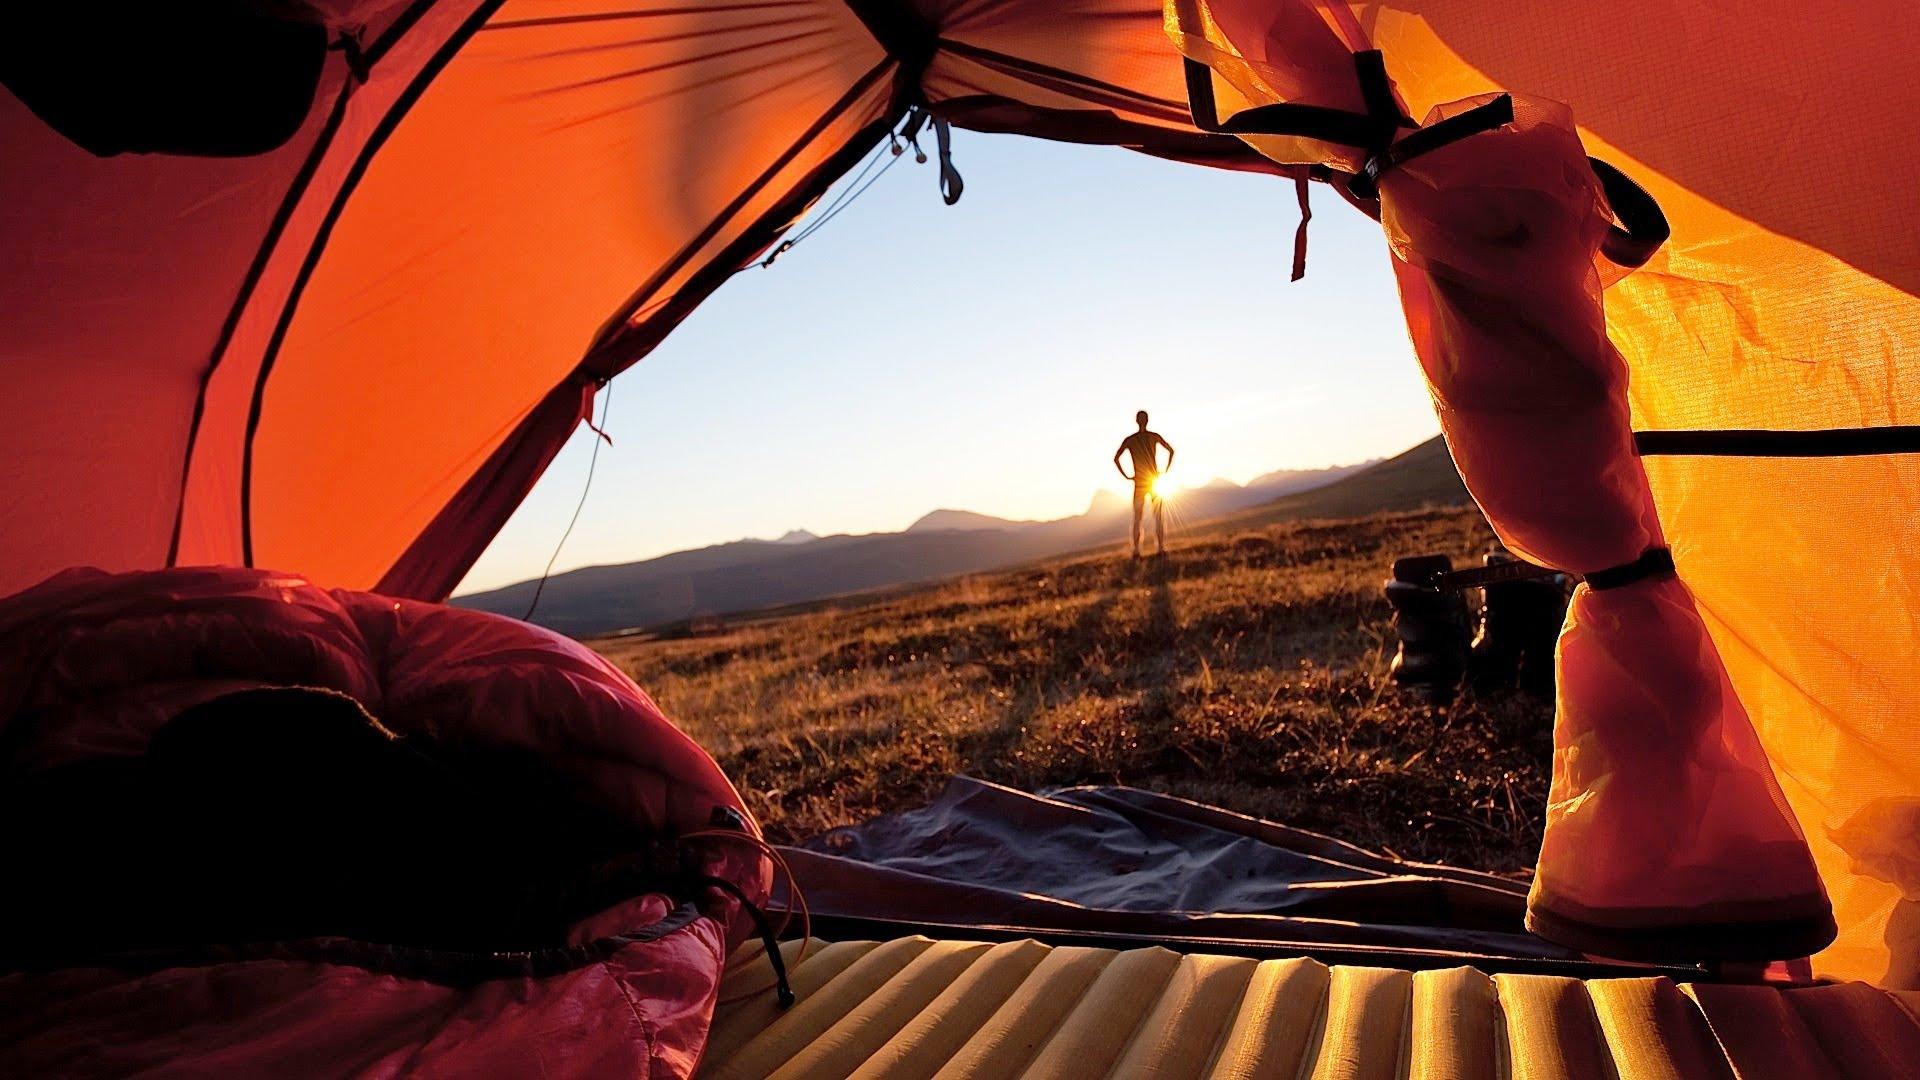 Fall Wallpapers For Desktop Idaho Camping Backgrounds Free Download Pixelstalk Net